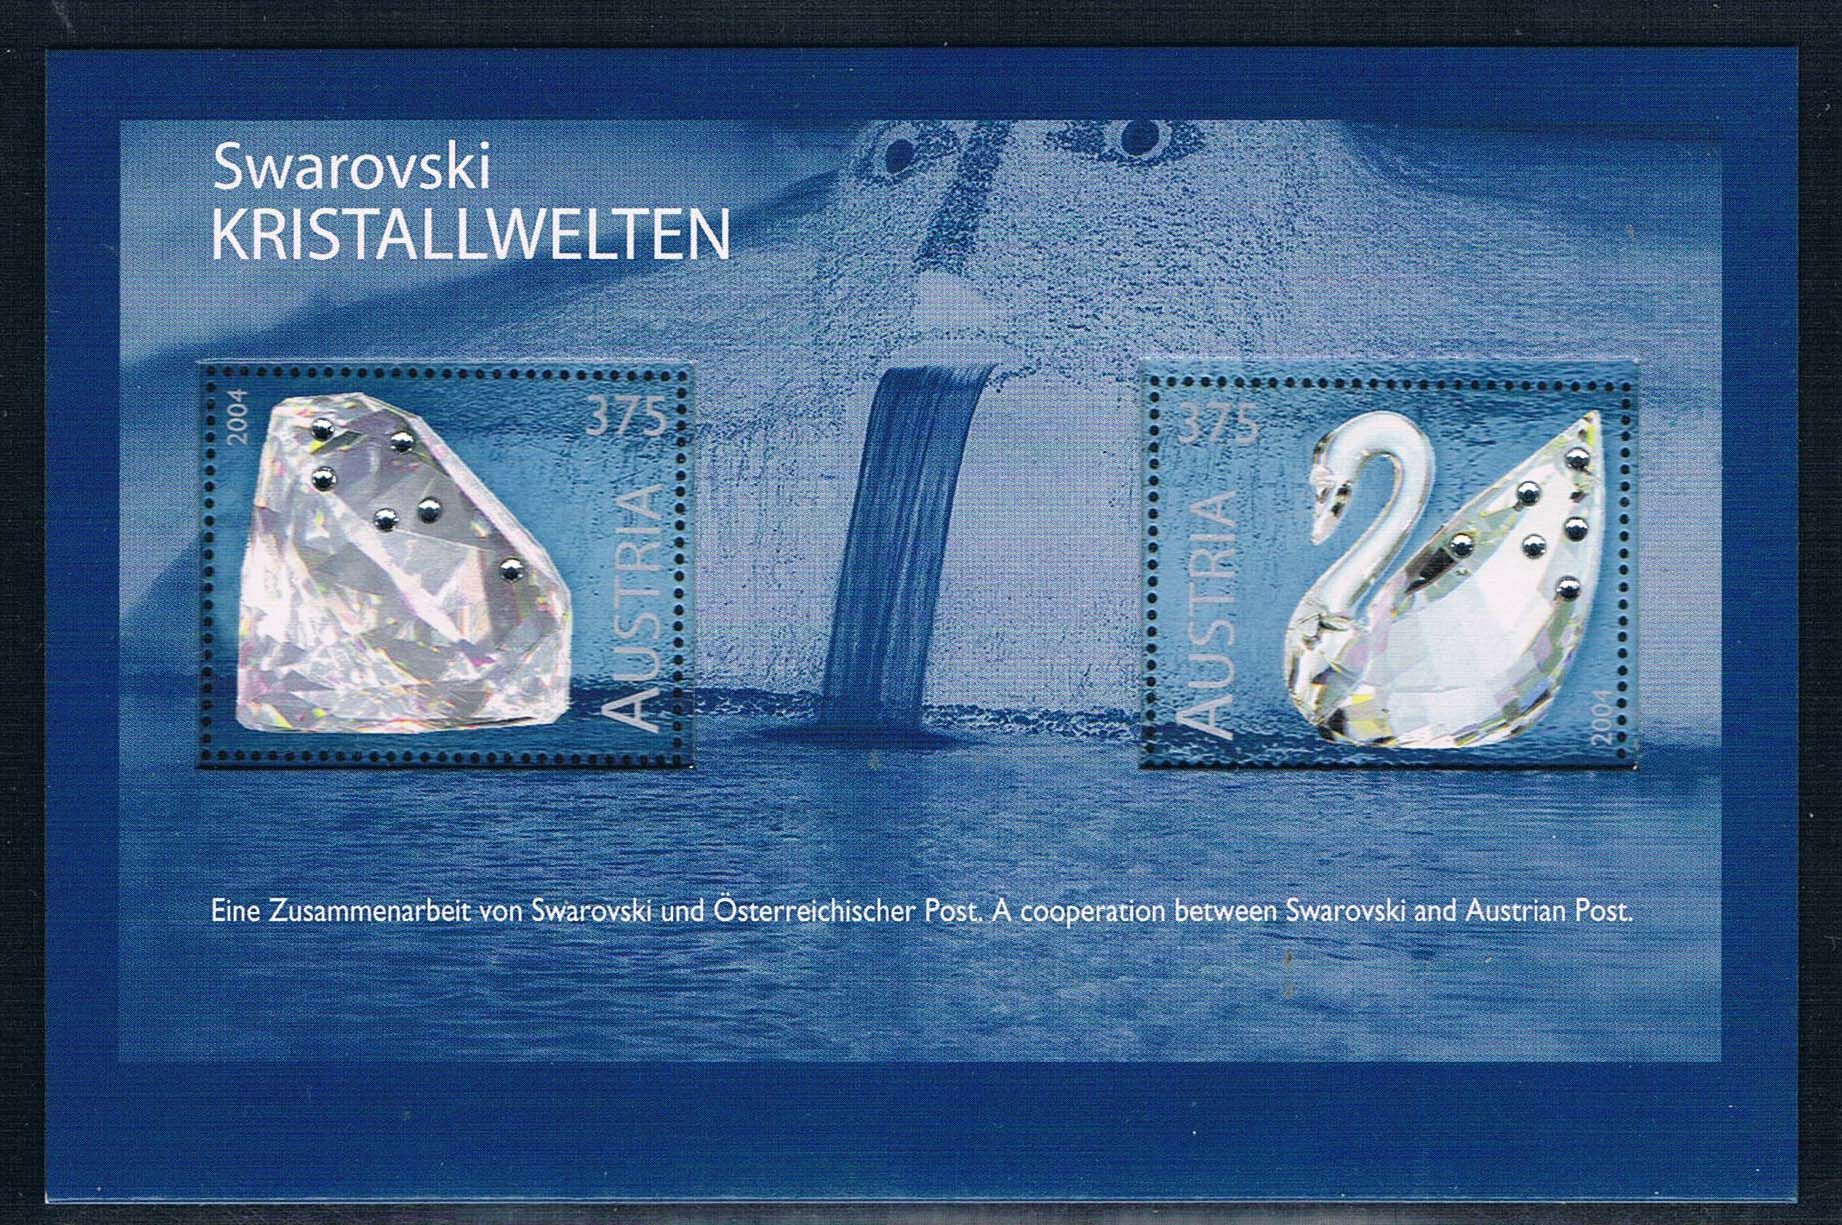 AU1111 Austria 2004 SWAROVSKI Crystal Swan heterogeneous 1MS new 0714 at91sam7s128 au at91sam7s128